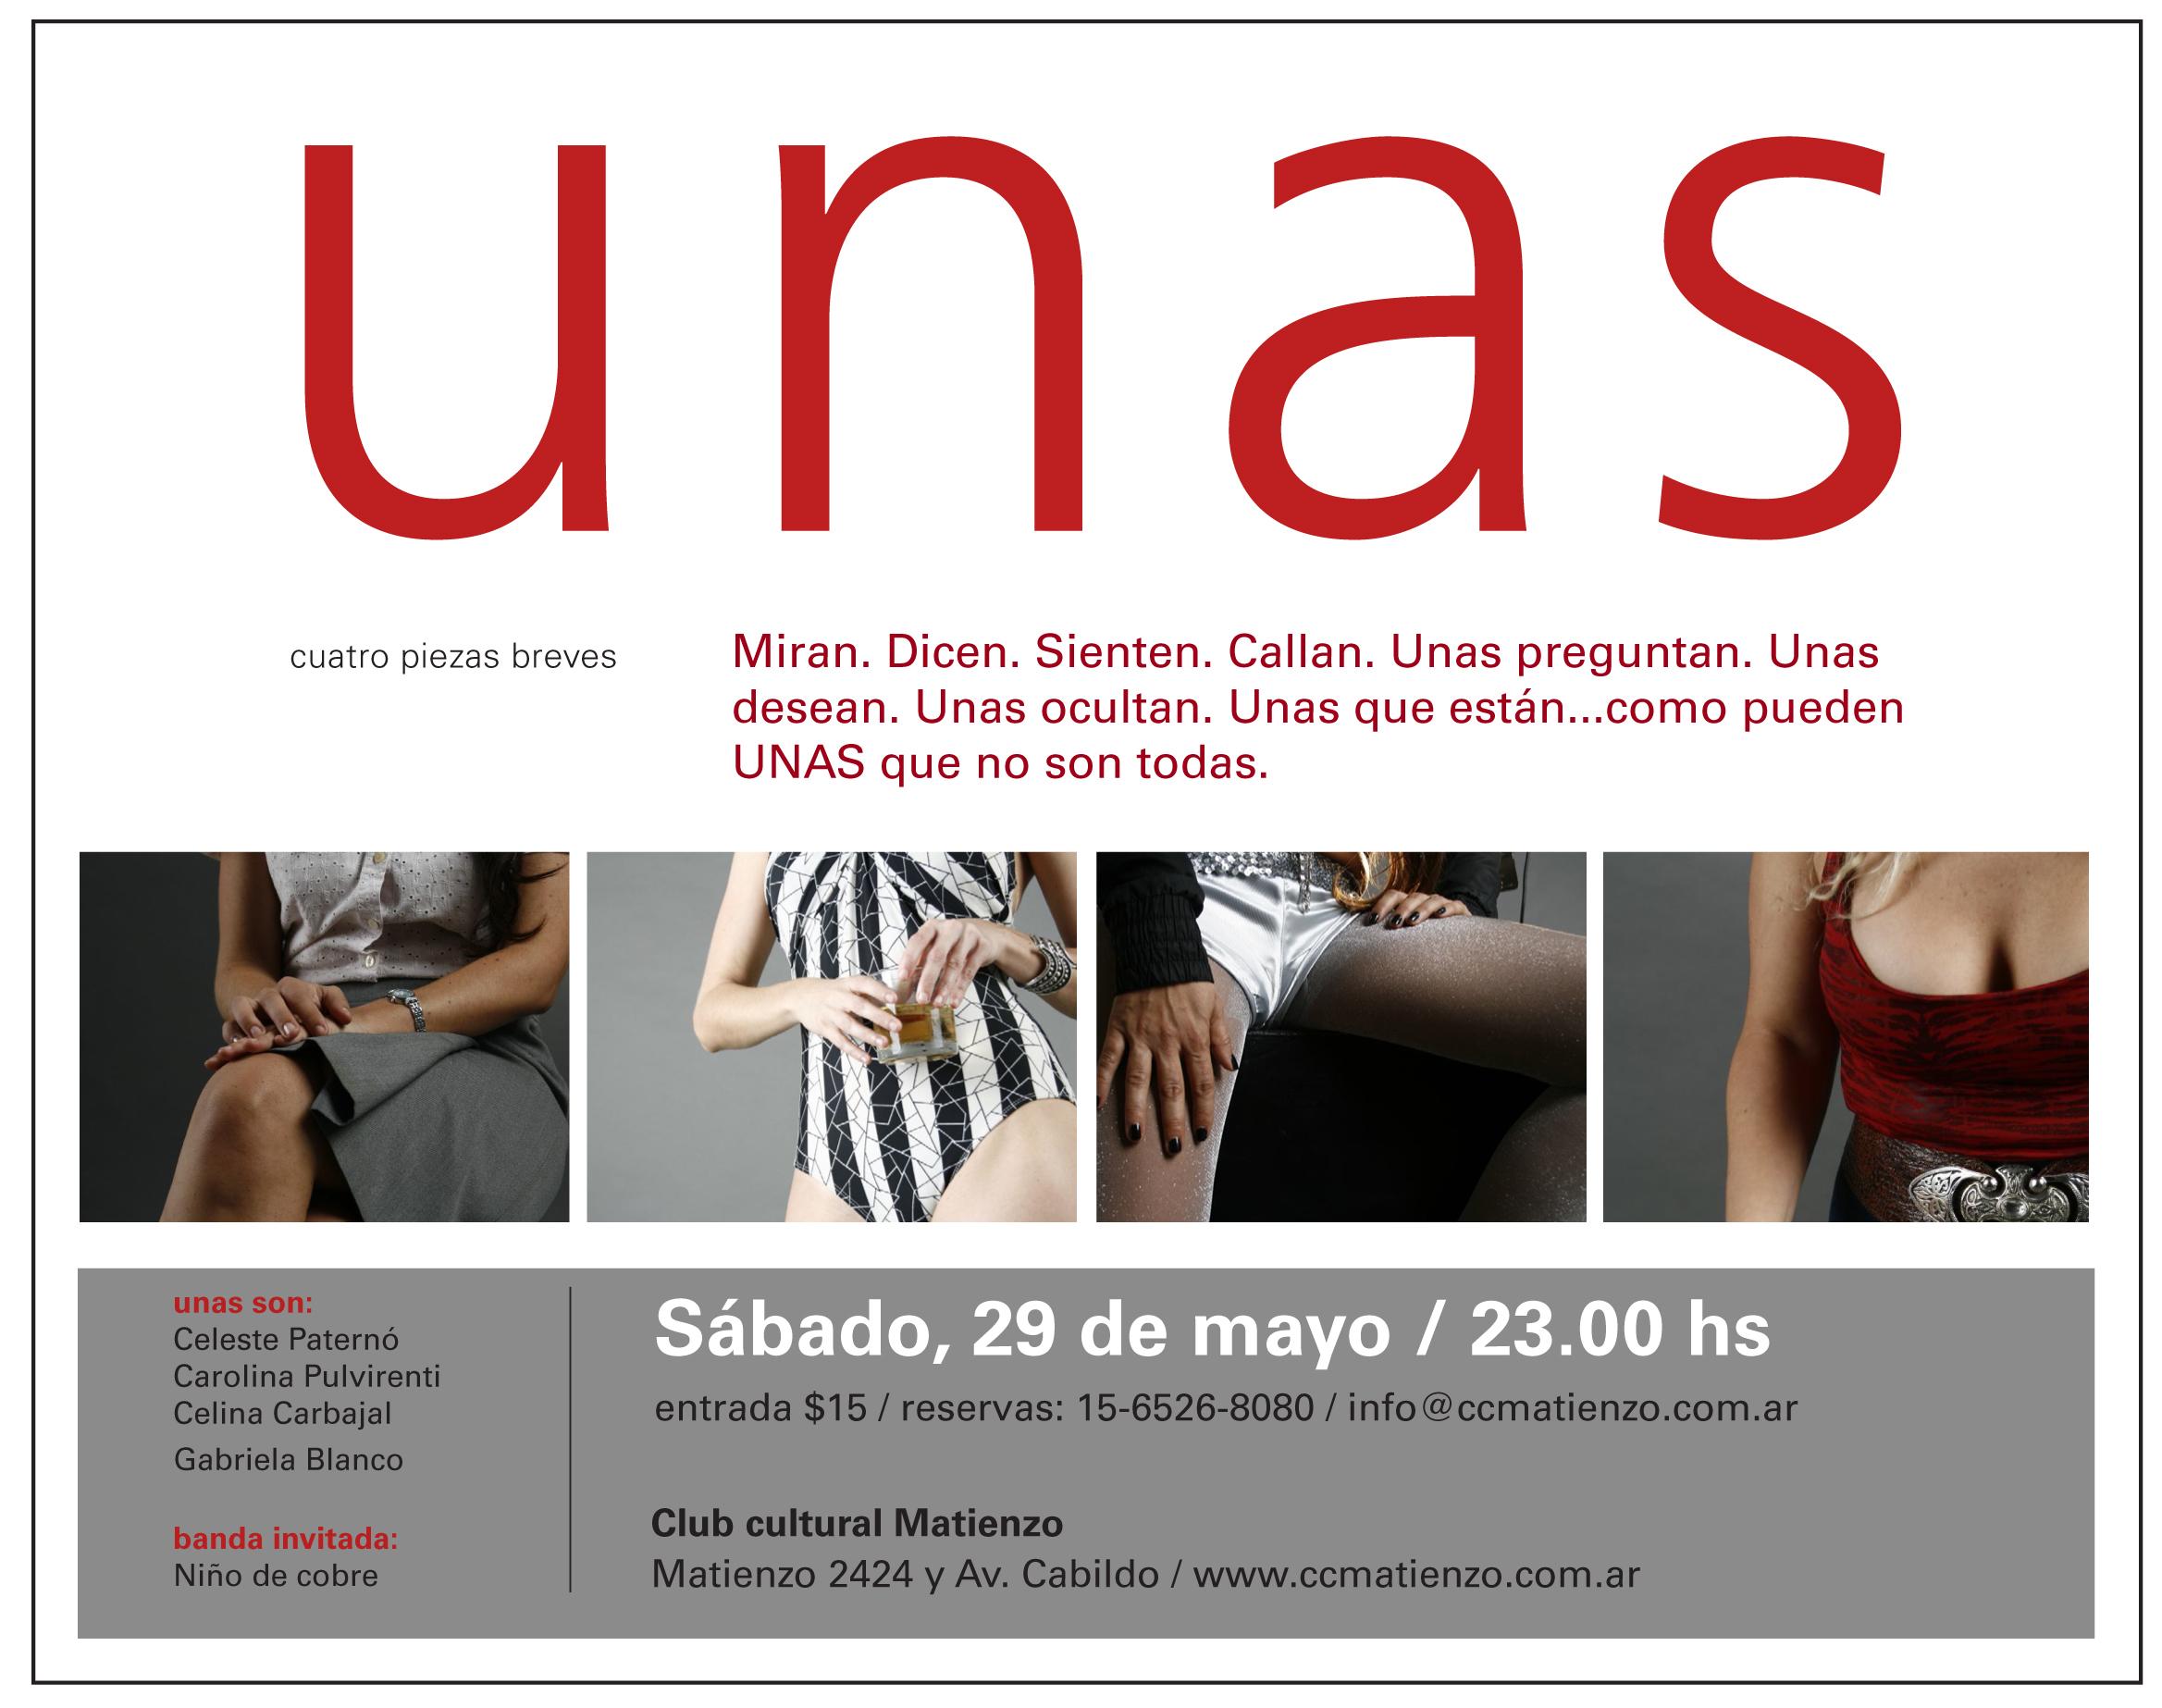 http://clubculturalmatienzo.files.wordpress.com/2010/05/unas_matienzo_flyer.jpg